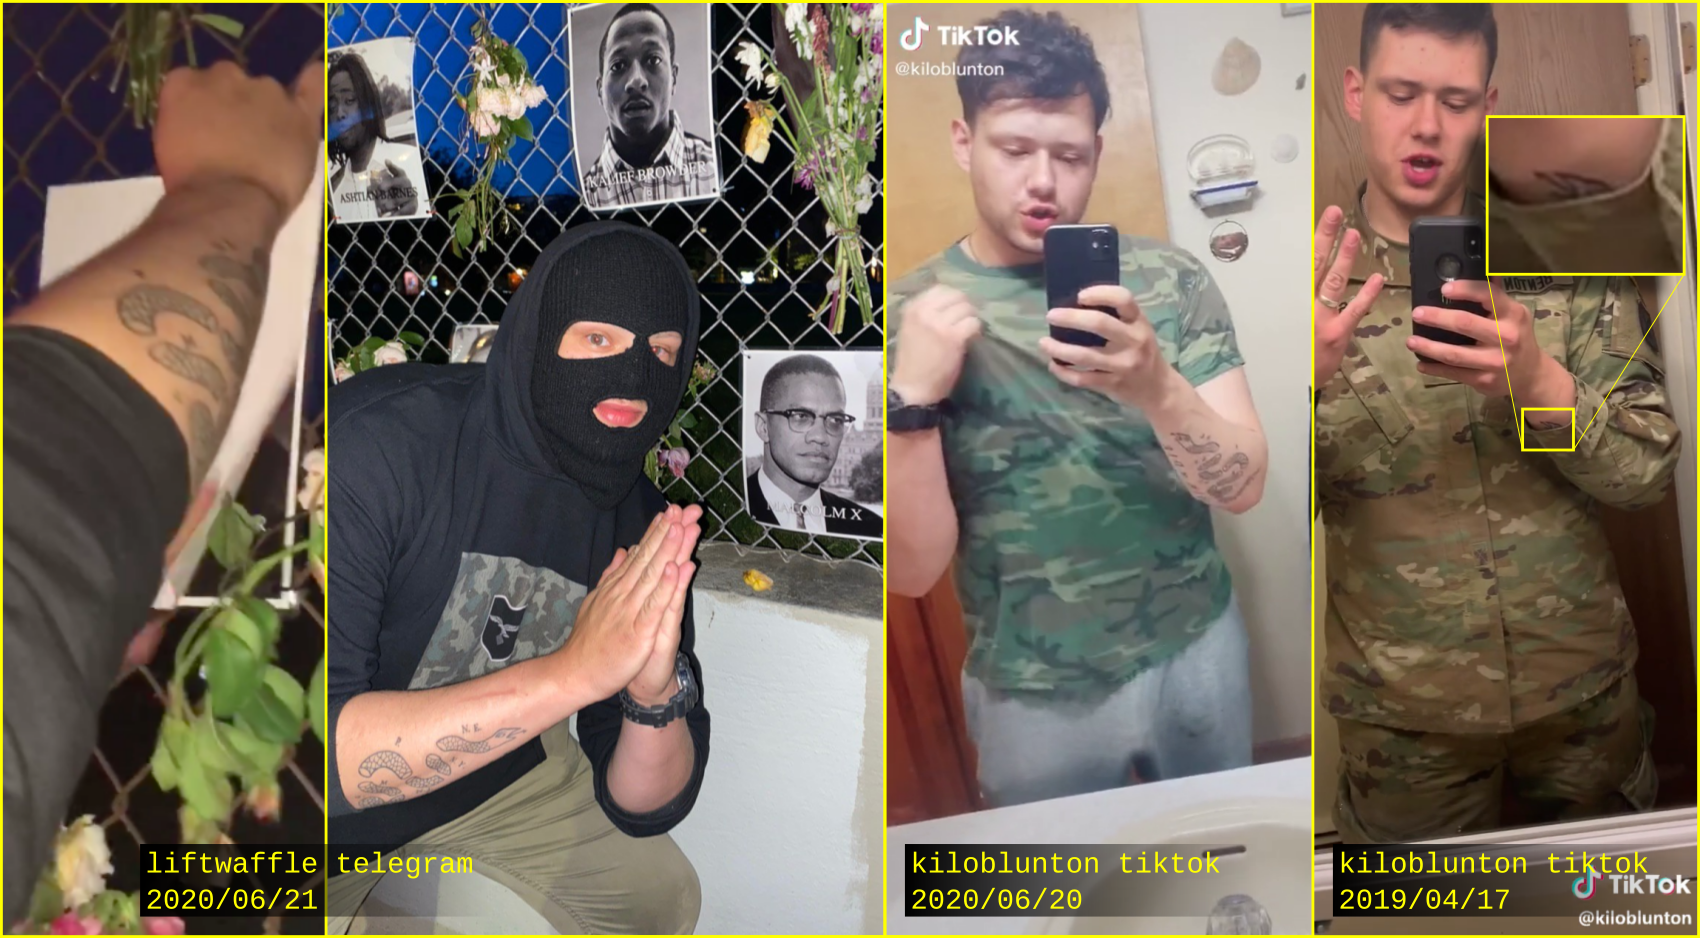 - IMAGE - Kyle Benton liftwaffle tattoo comparison